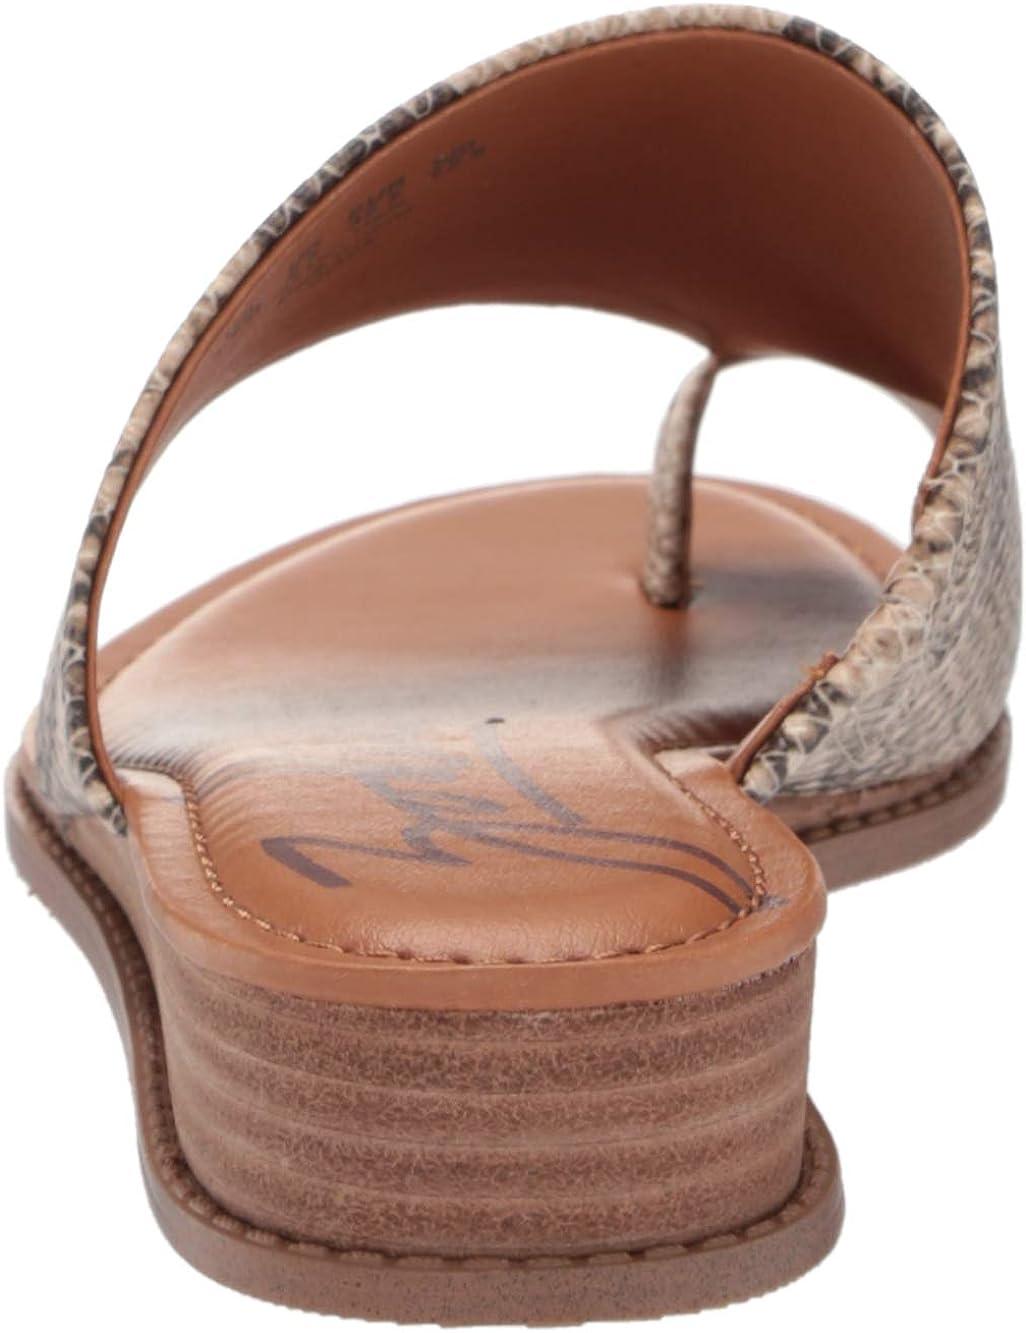 Zodiac Women's Giada Slide Sandal, Natural, 6